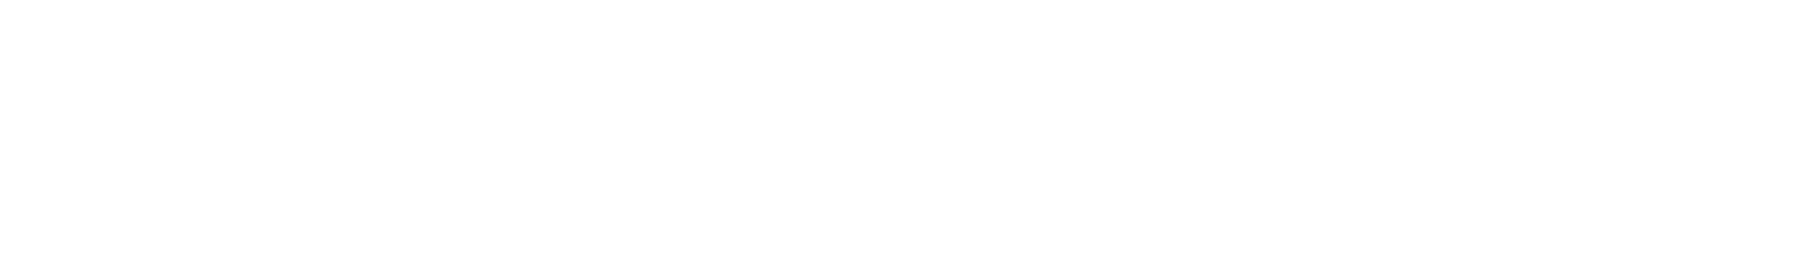 242718 188 darbuka doumbek groove fill 188 bpm wav